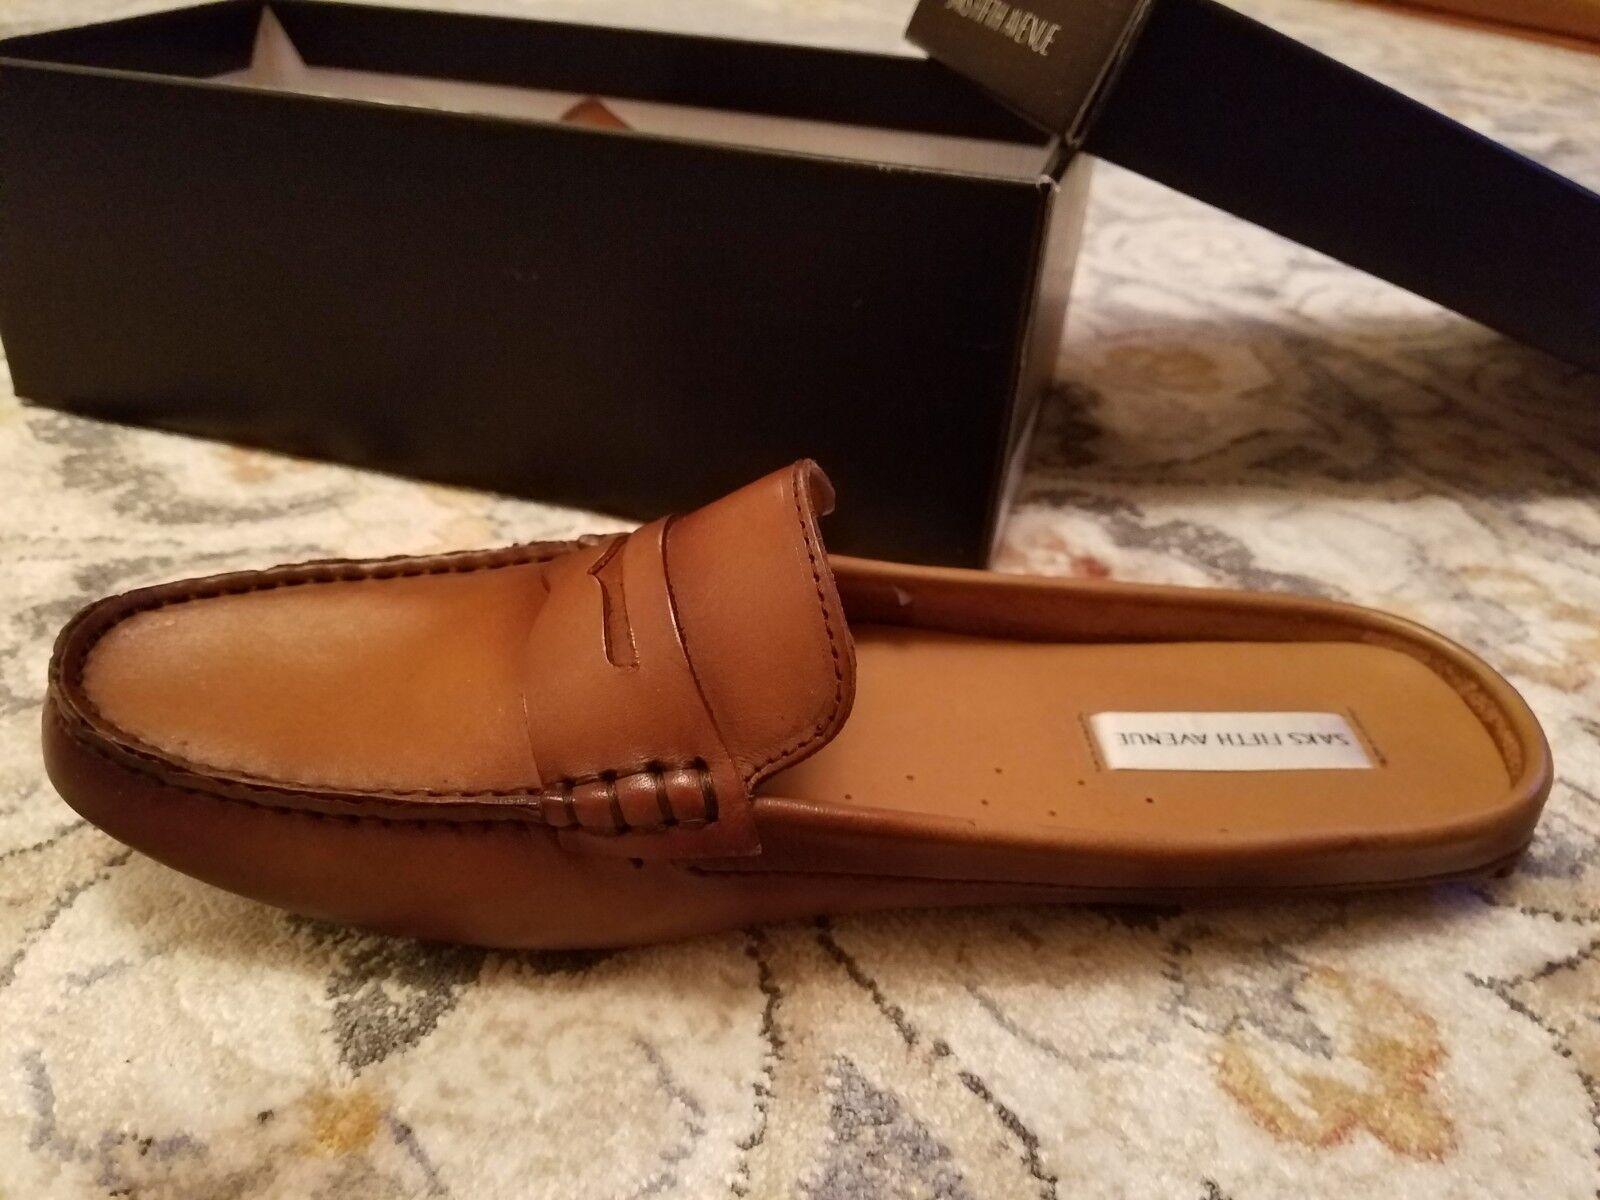 NEW BOX saks fifth avenue shoes leather flat mocassins slip on Lightwear loafers